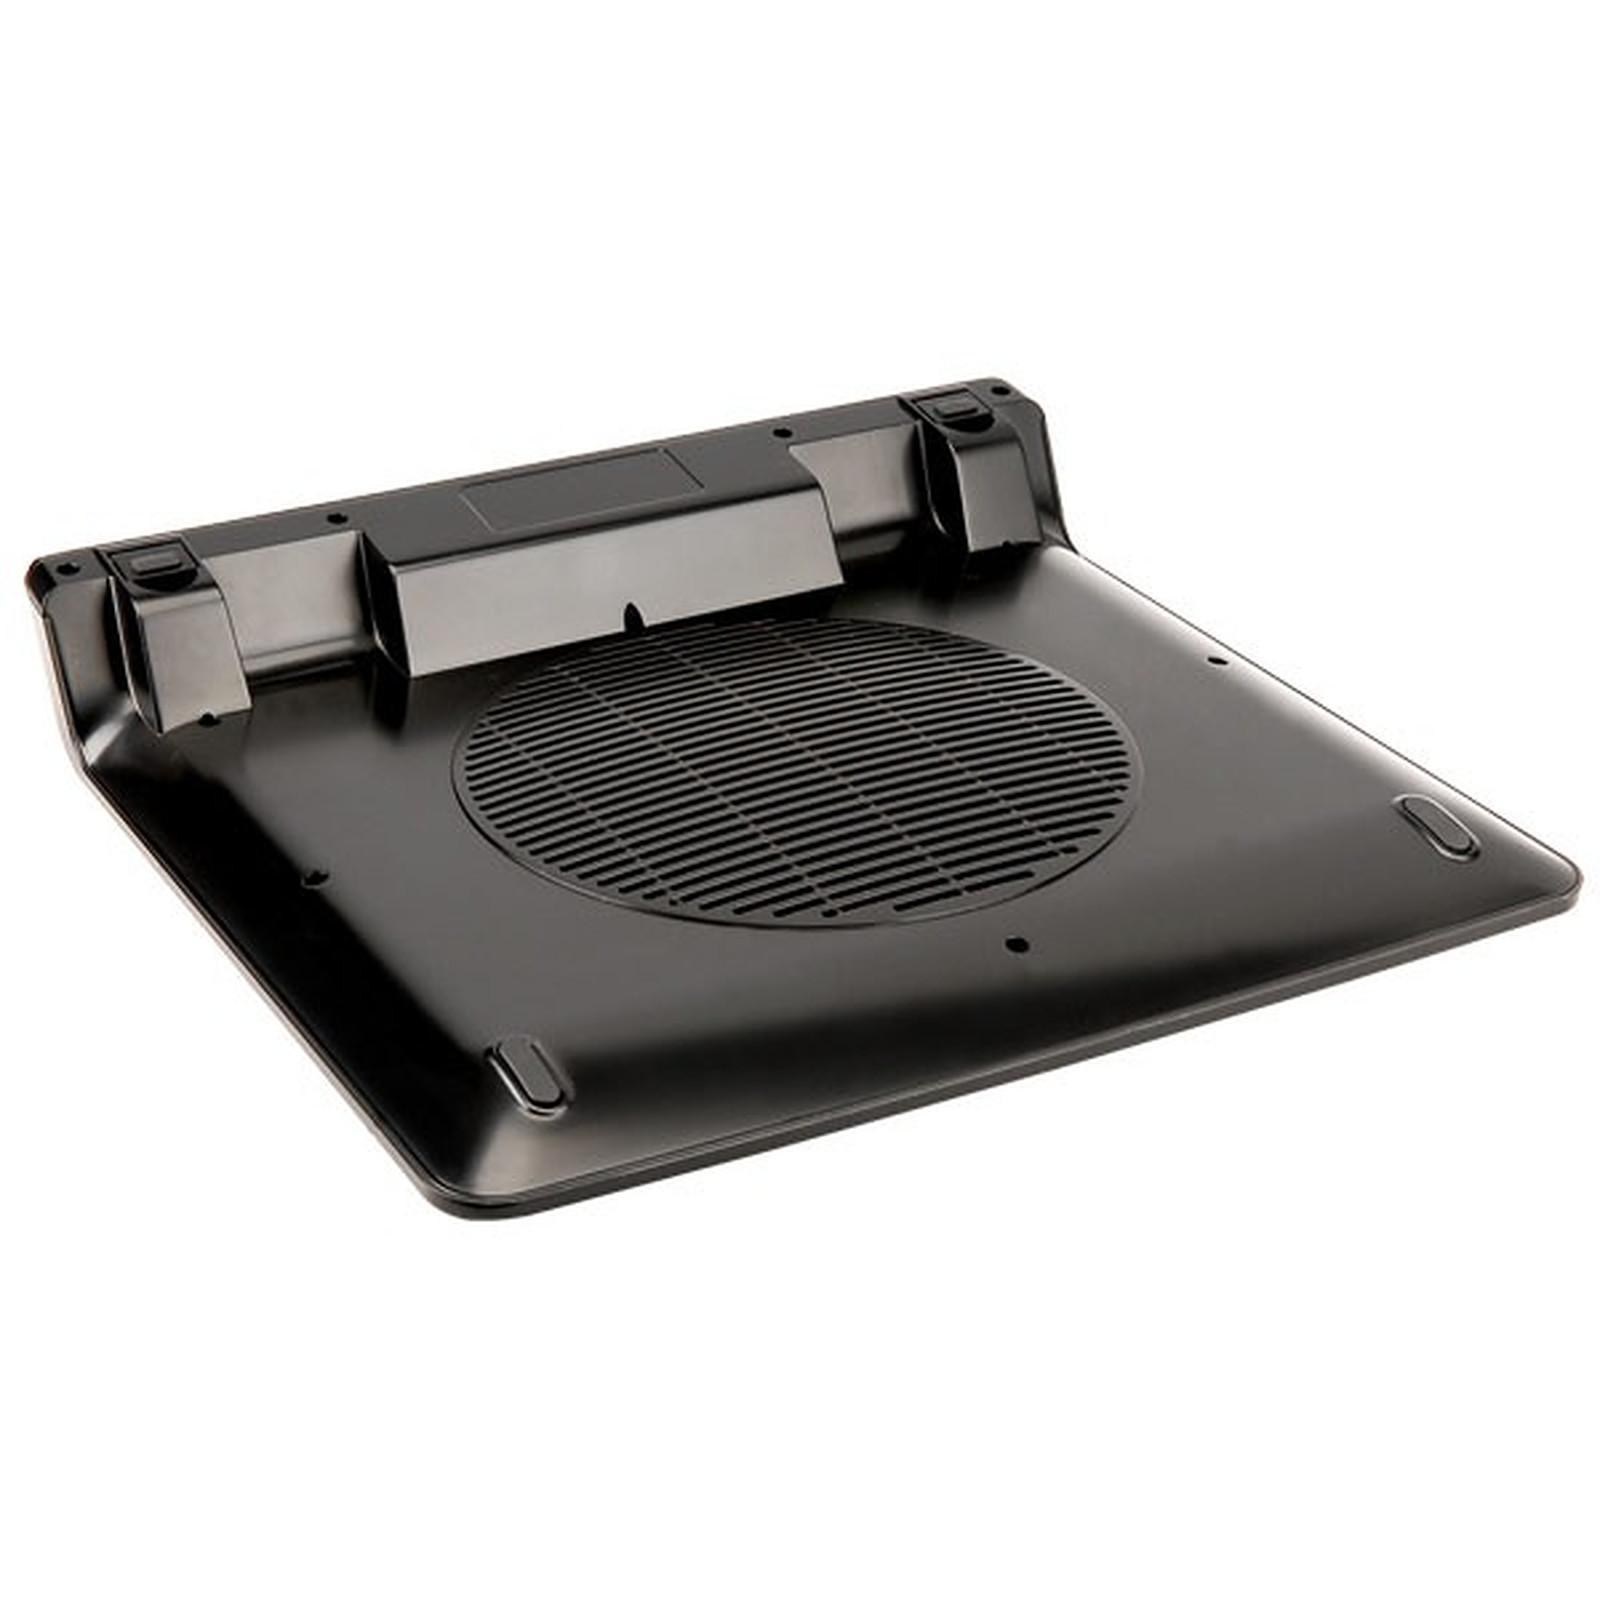 Zalman Zm Nc3000u Ventilateur Pc Portable Zalman Sur Ldlc Com Museericorde